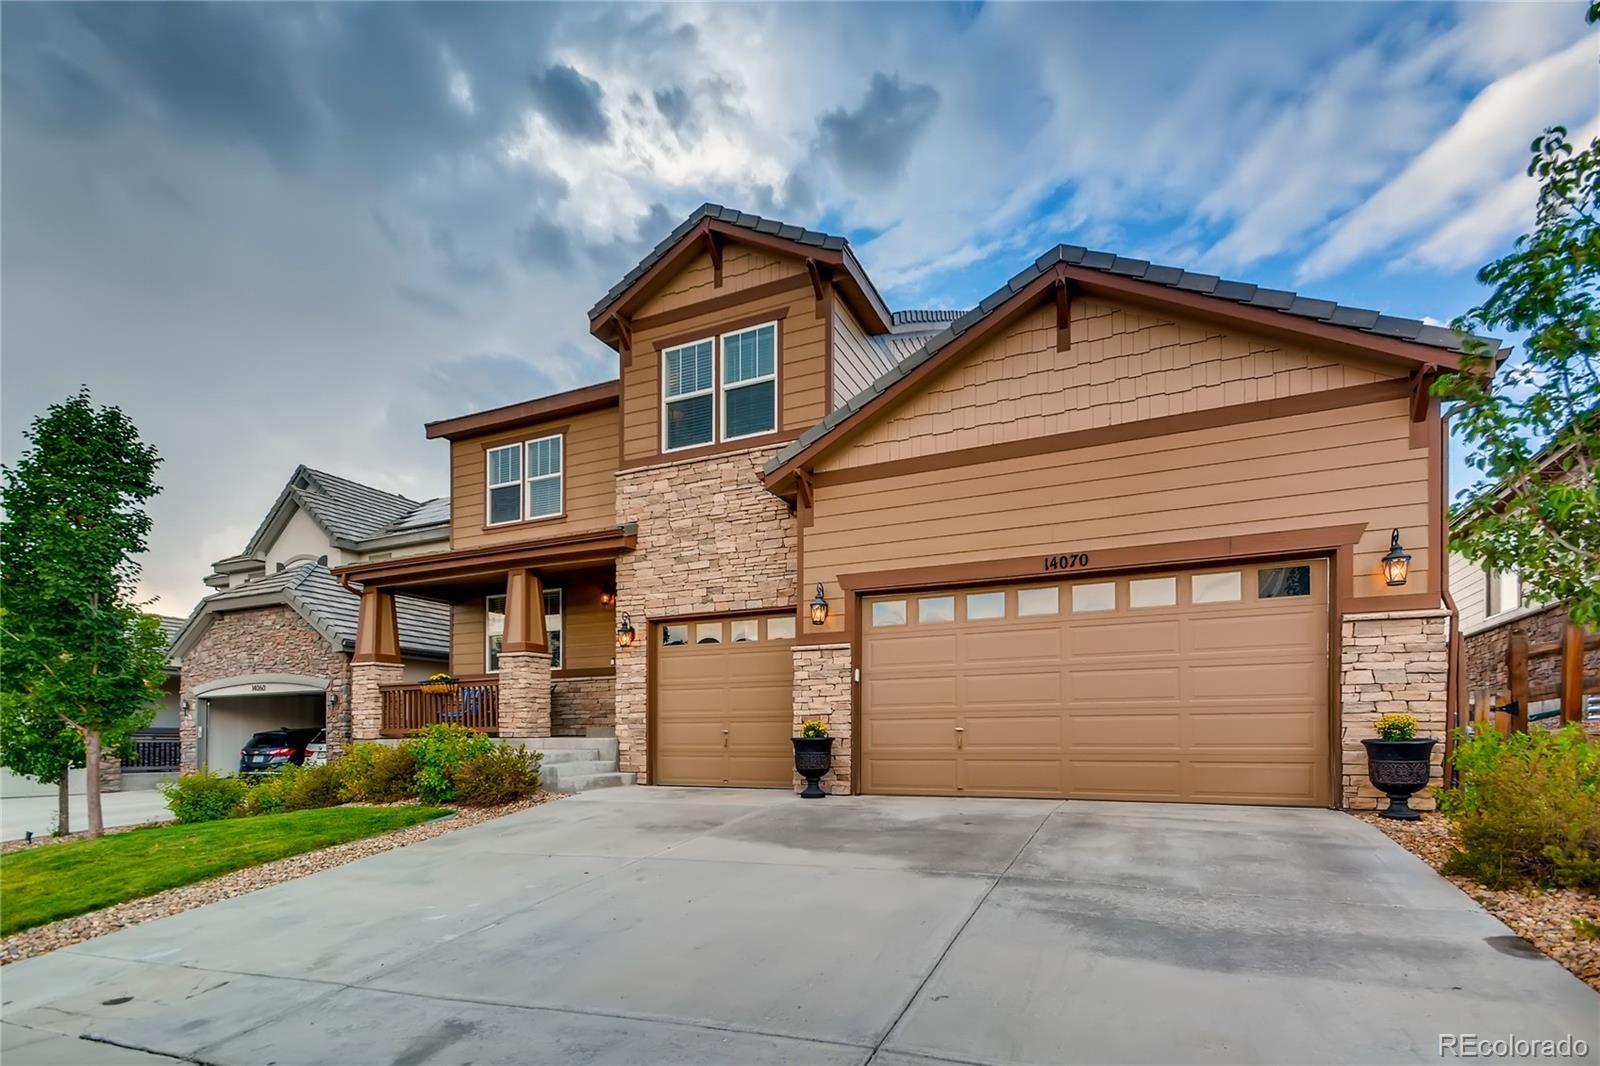 14070 Sierra Ridge Circle, Parker, CO 80134 - MLS#: 5582564